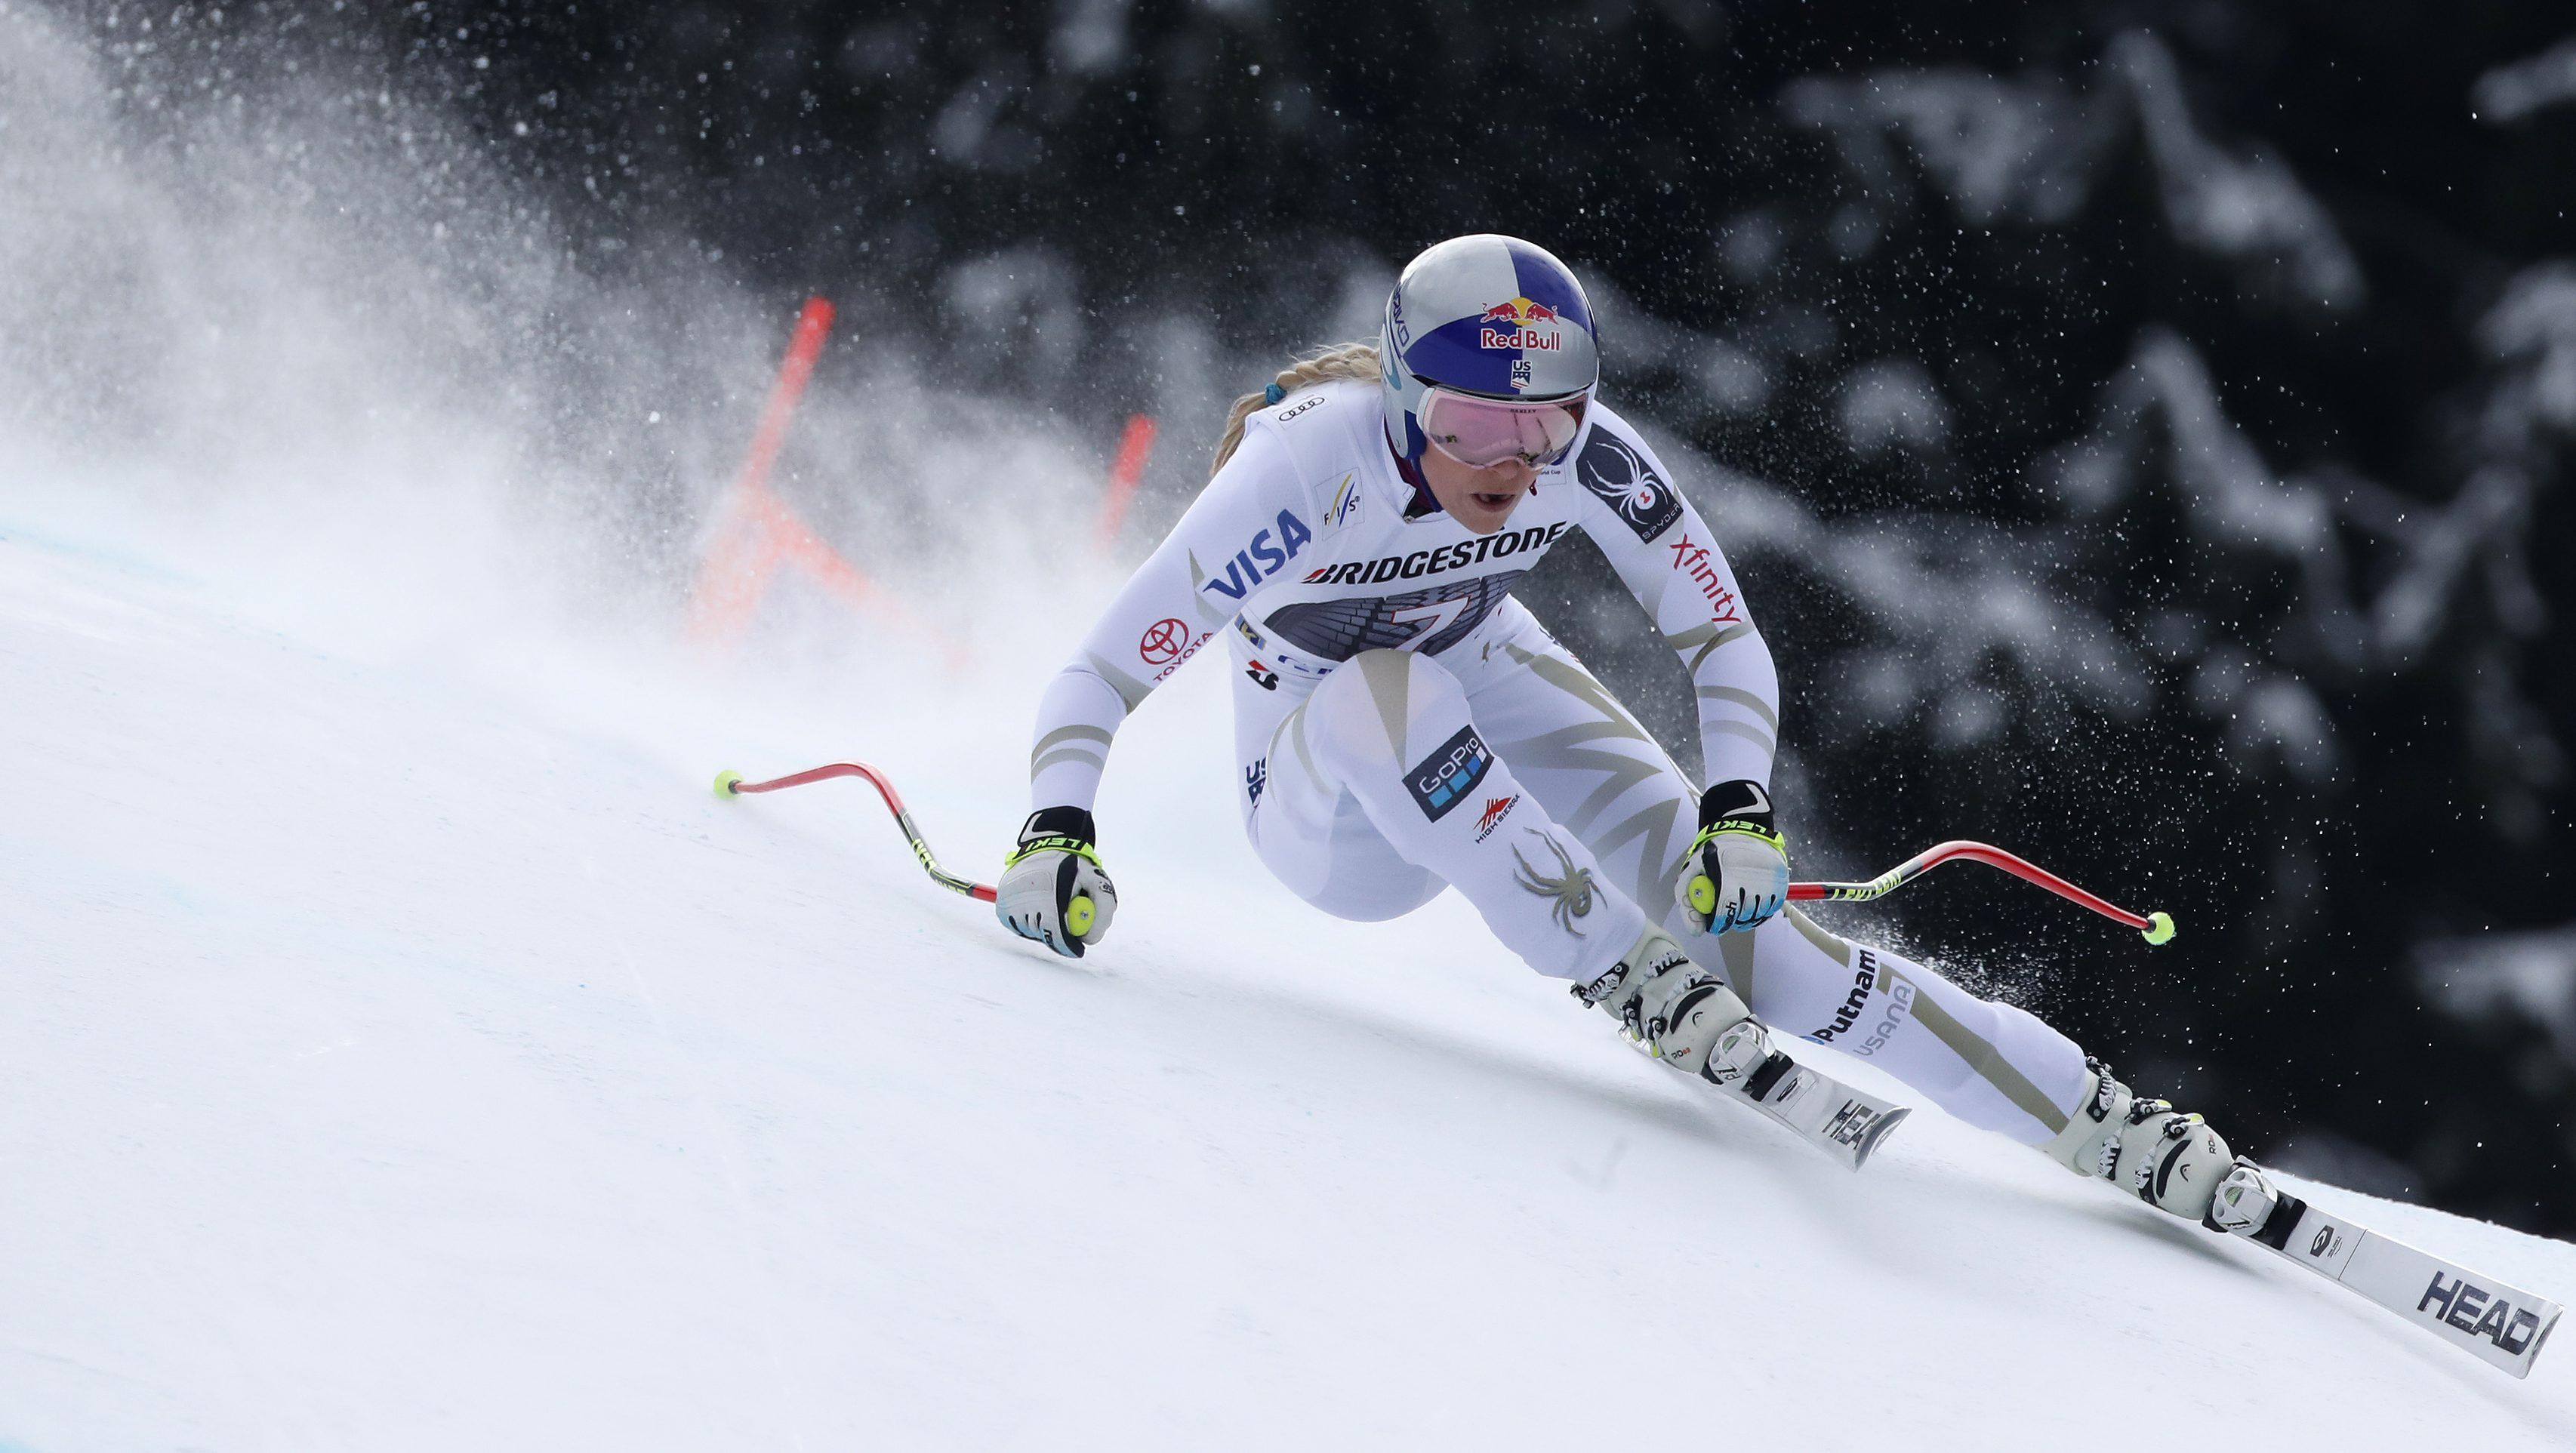 Alpine Skiing - FIS Alpine Skiing World Cup - Women's Alpine Downhill - Garmisch-Partenkirchen, Germany - February 4, 2018 - Lindsey Vonn of the U.S. in action. REUTERS/Dominic Ebenbichler - UP1EE240X7I88